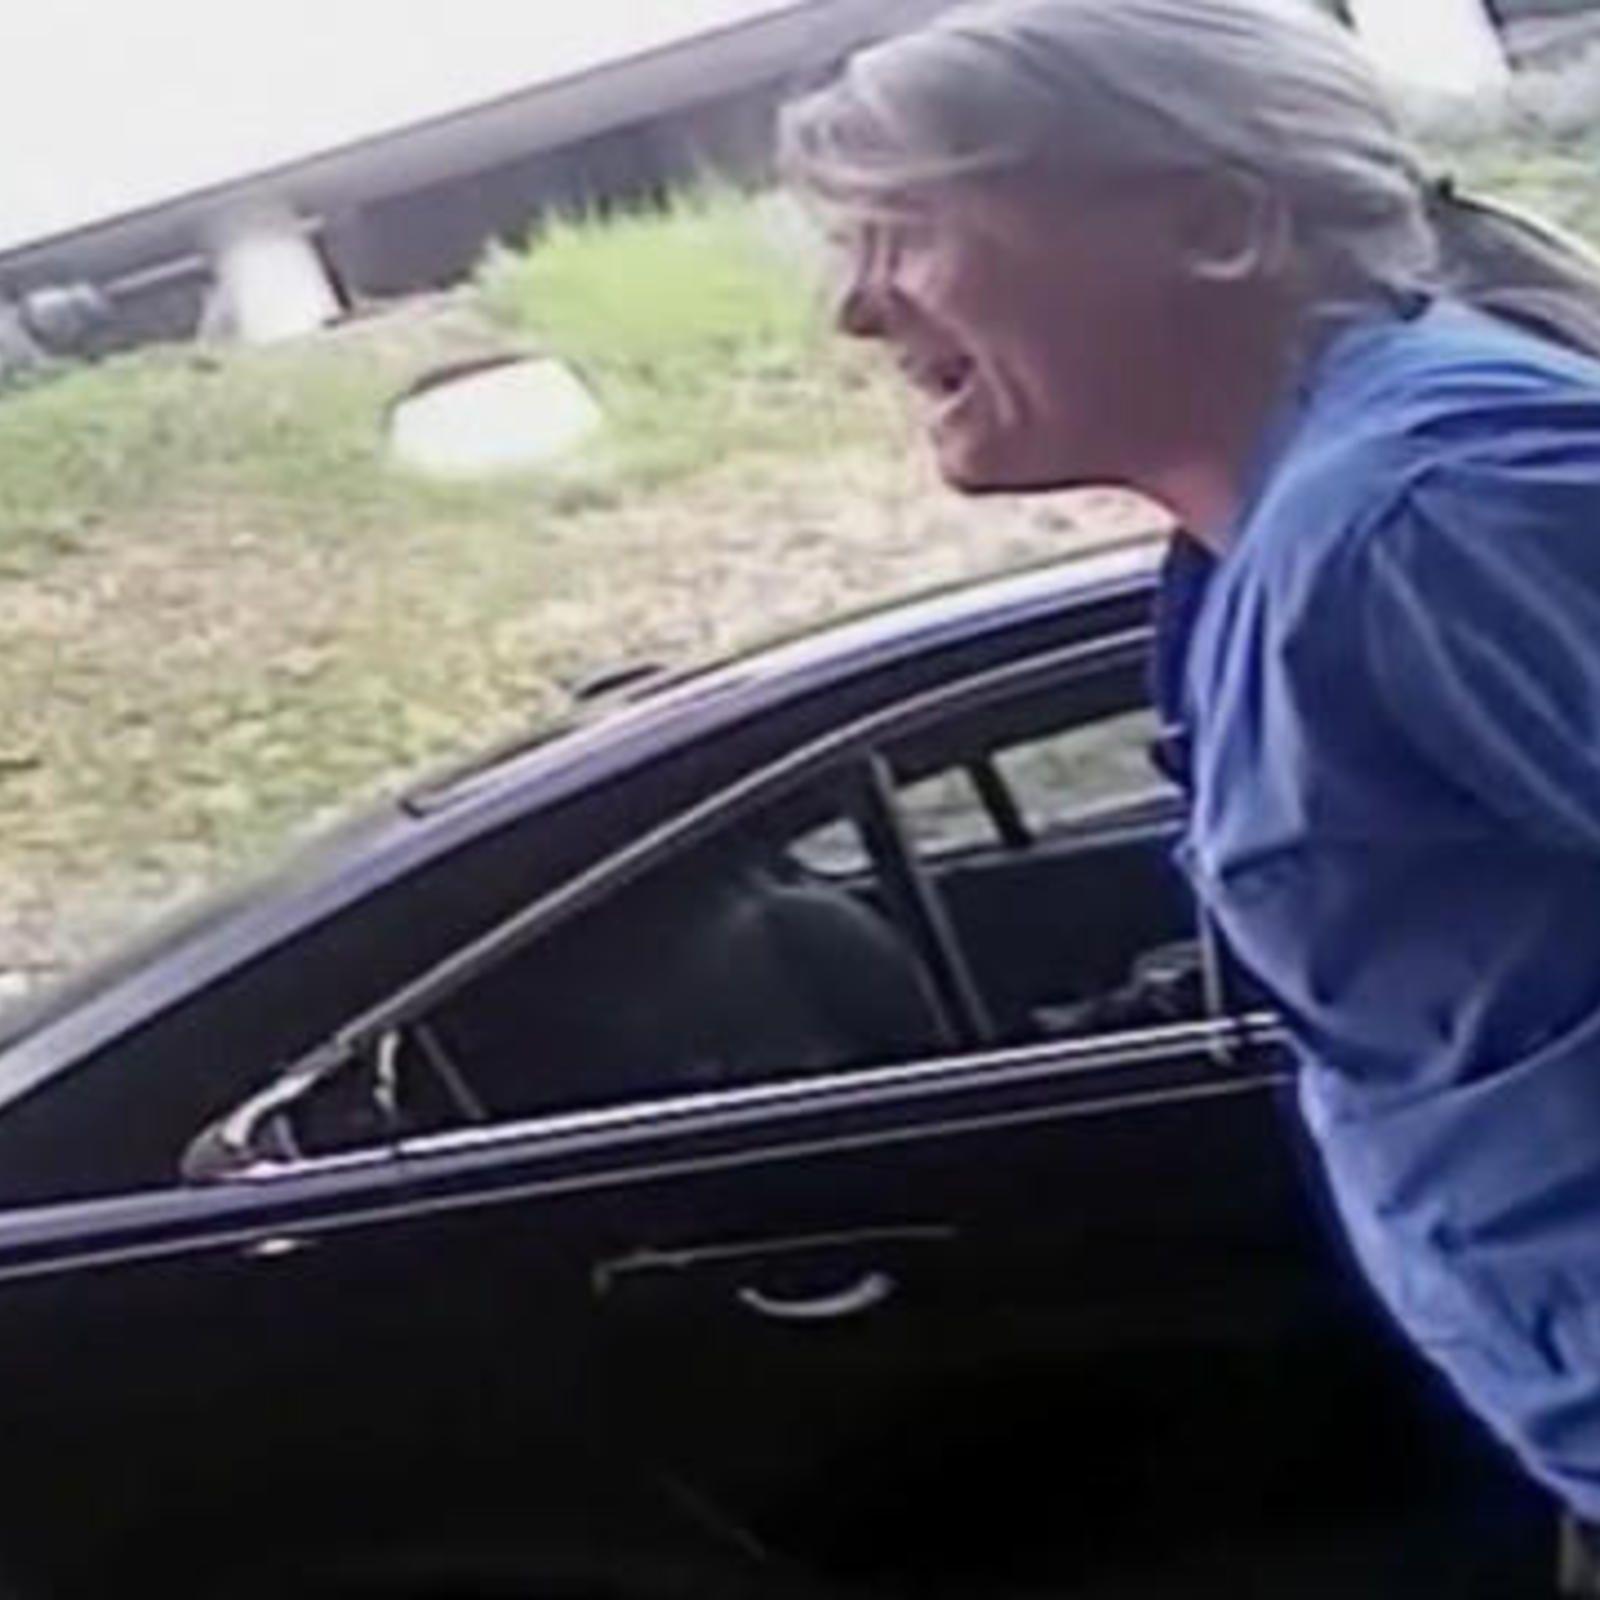 Cop who arrested Utah nurse put on administrative leave